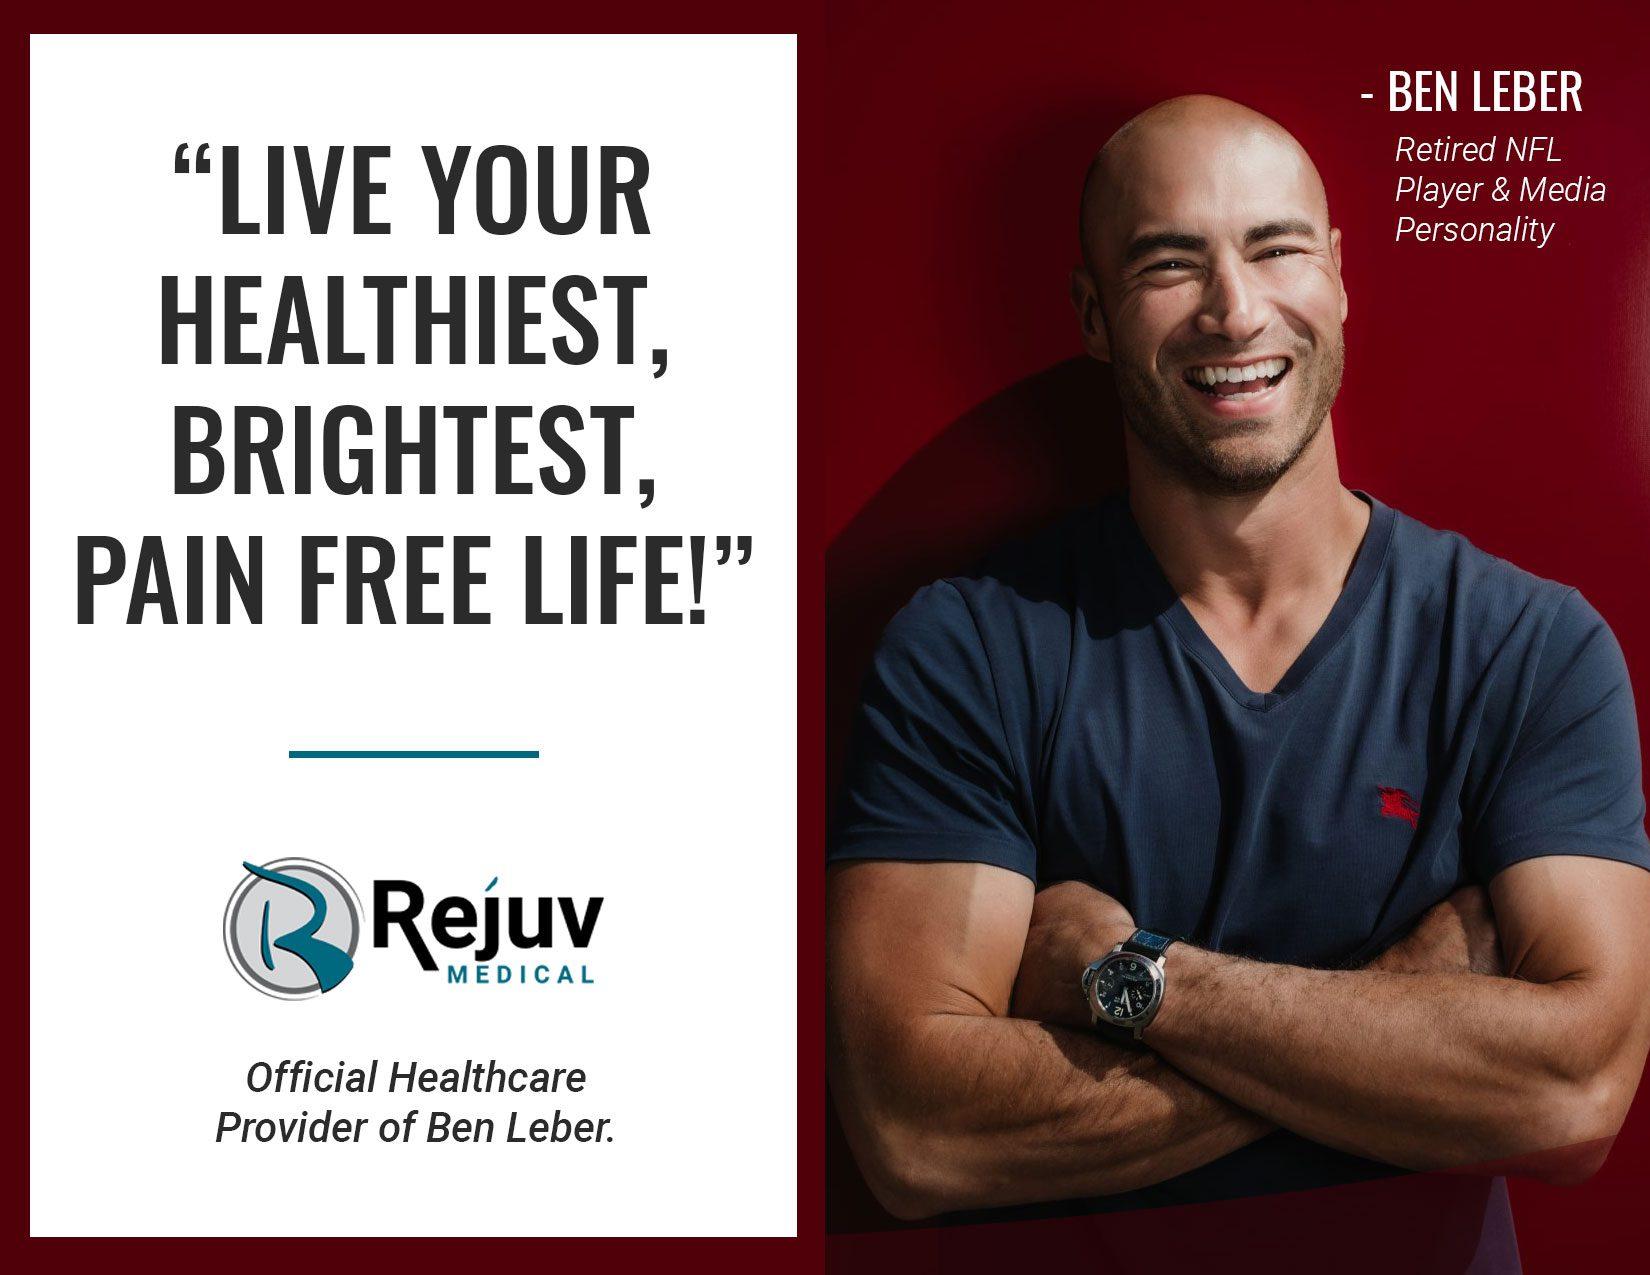 ben leber and rejuv medical